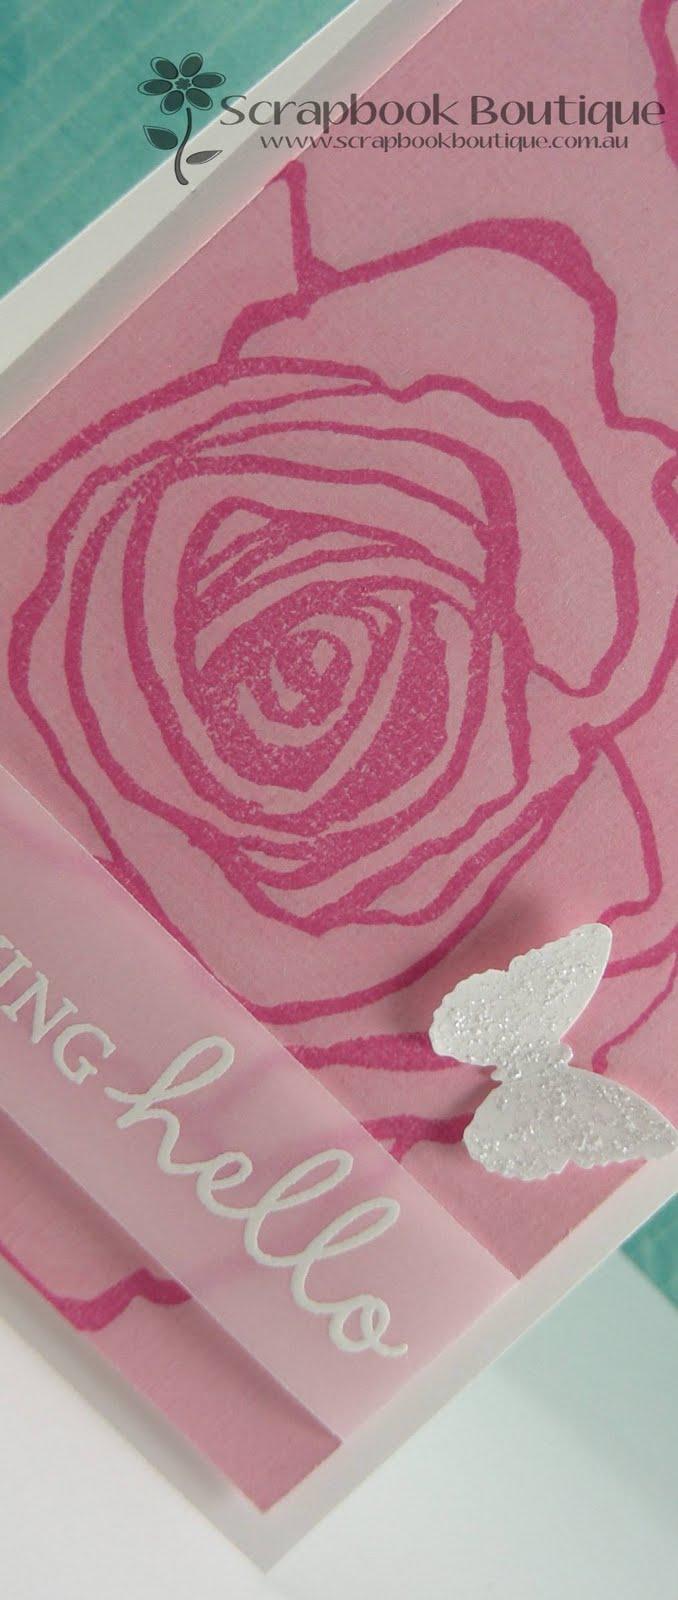 Accessories Fiskars Stamp Press Goodbye Static Pad Heat Tool White Embossing Powder Martha Stewart